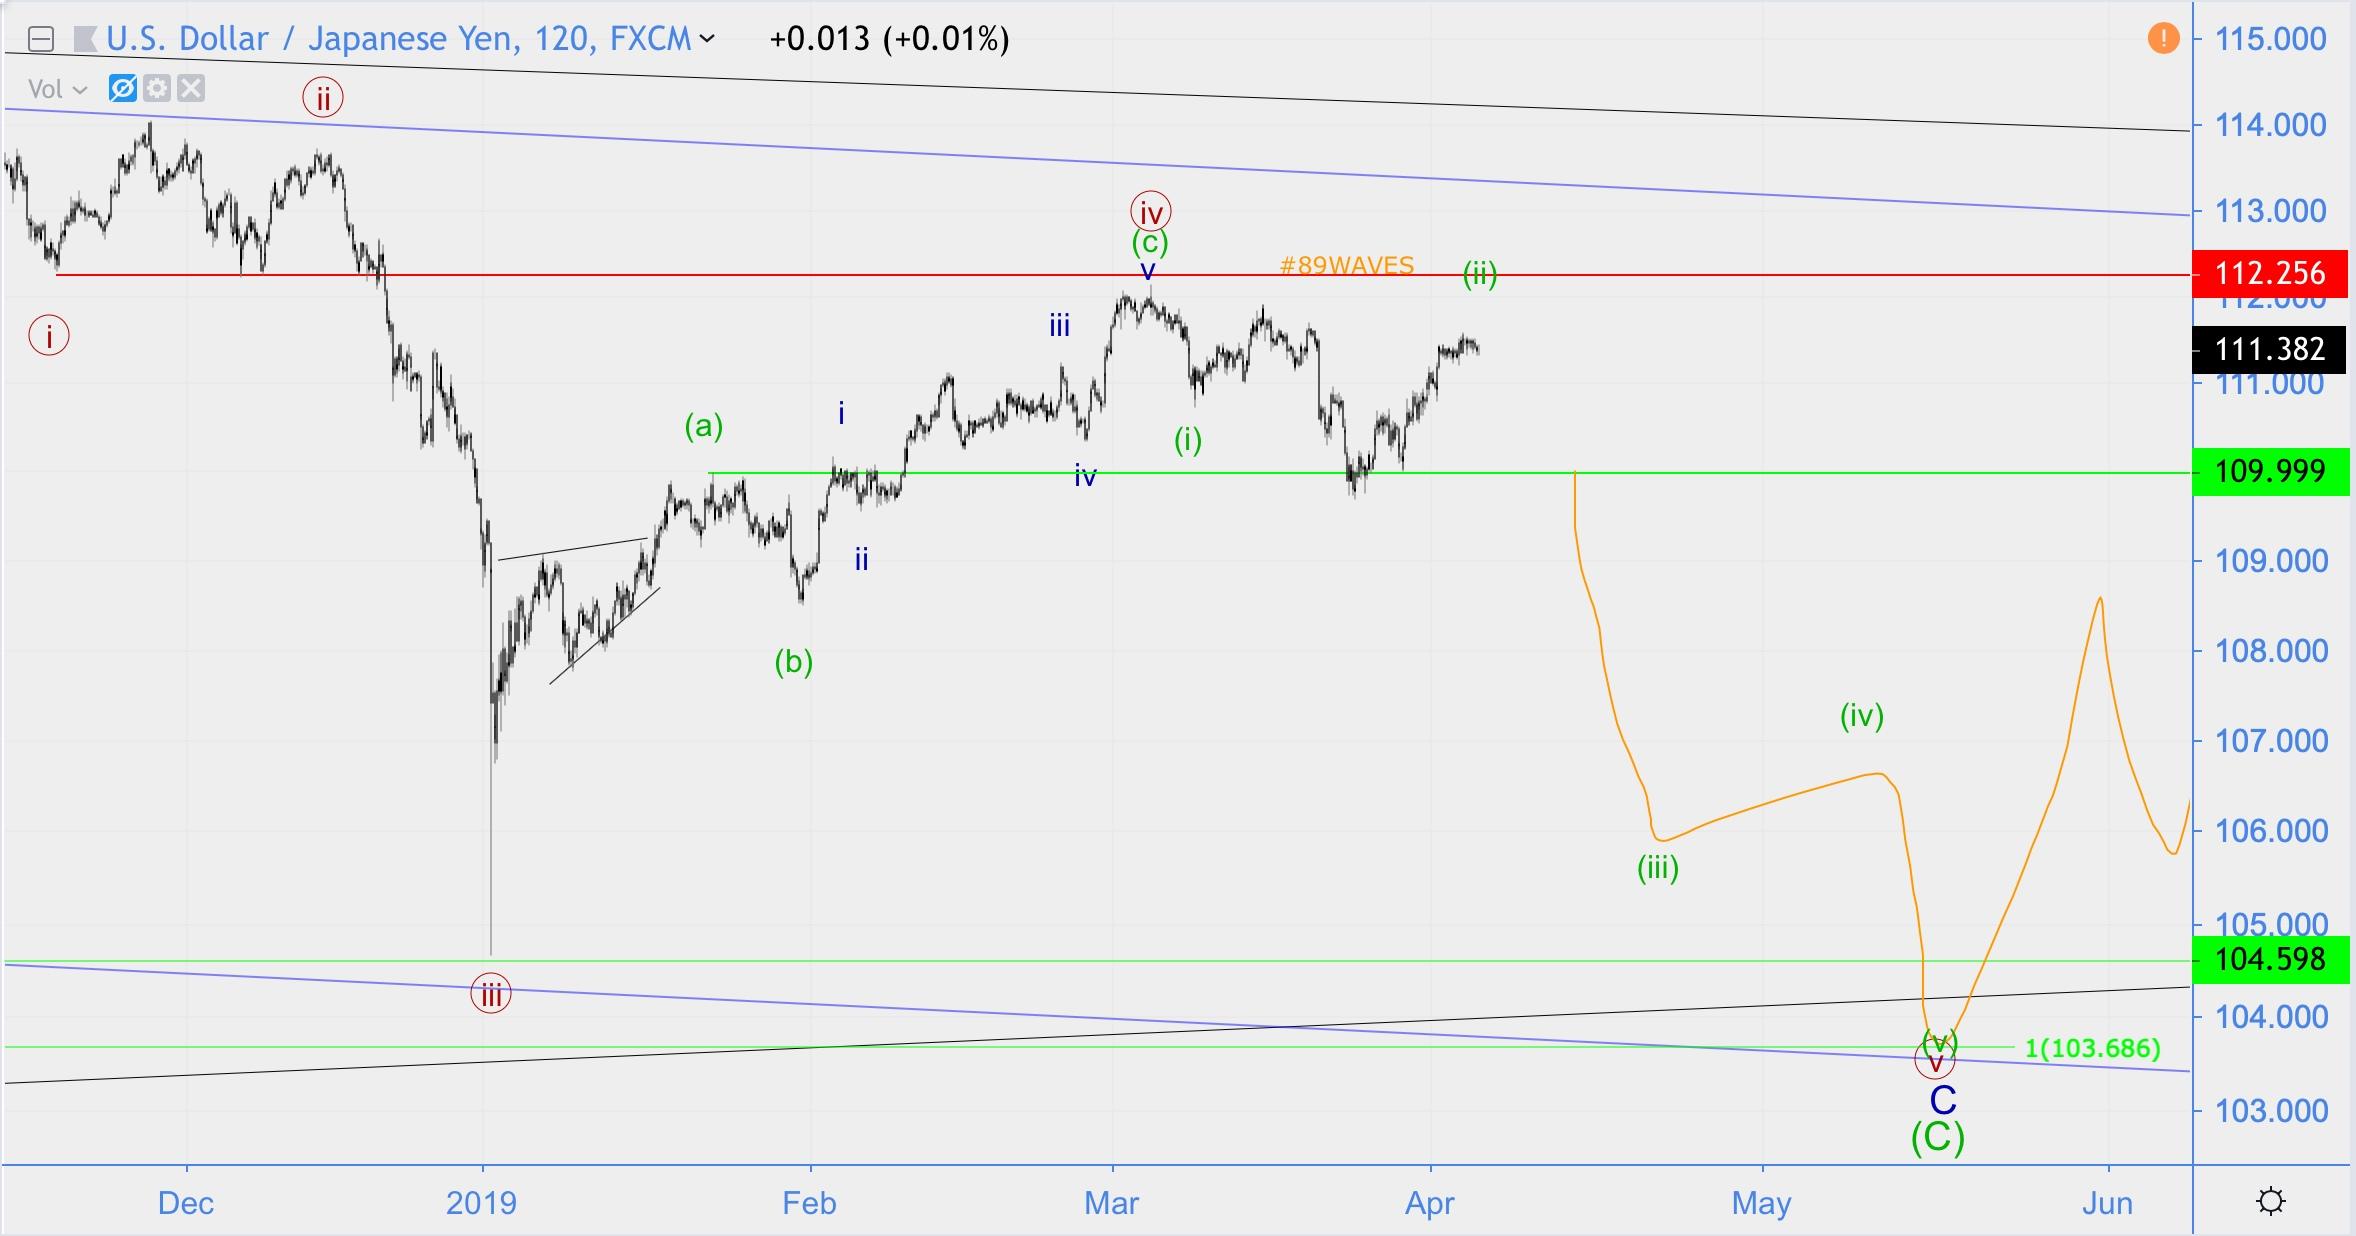 Волновой анализ USD/JPY, Apple, ETH/USD.